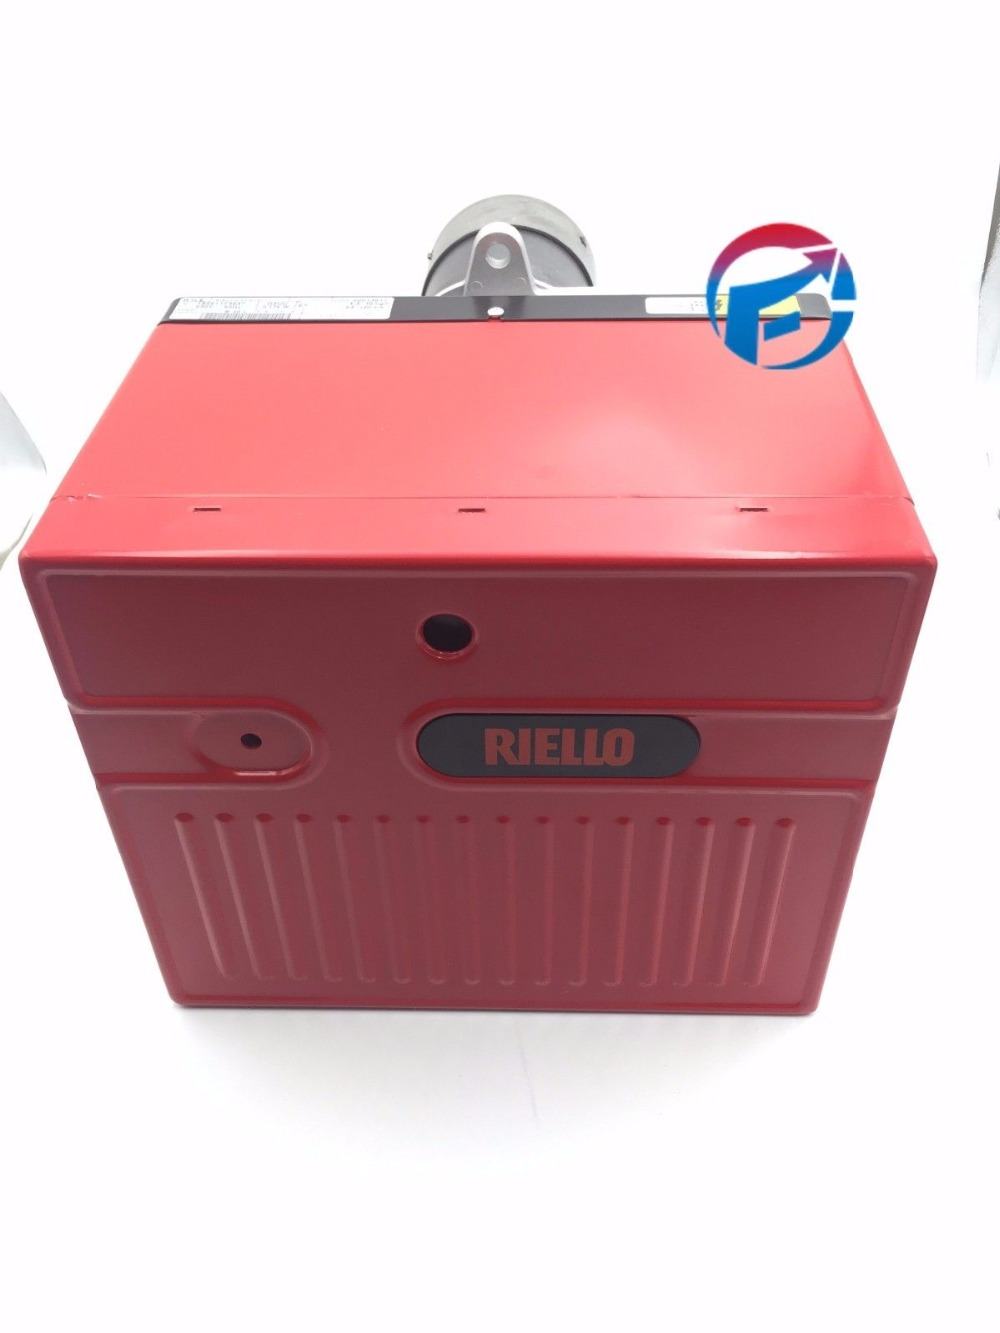 Riello R40 G10  Industrial Diesel Burner Oil Burner,Spray Booth Heating Burners,Kerosene Burner